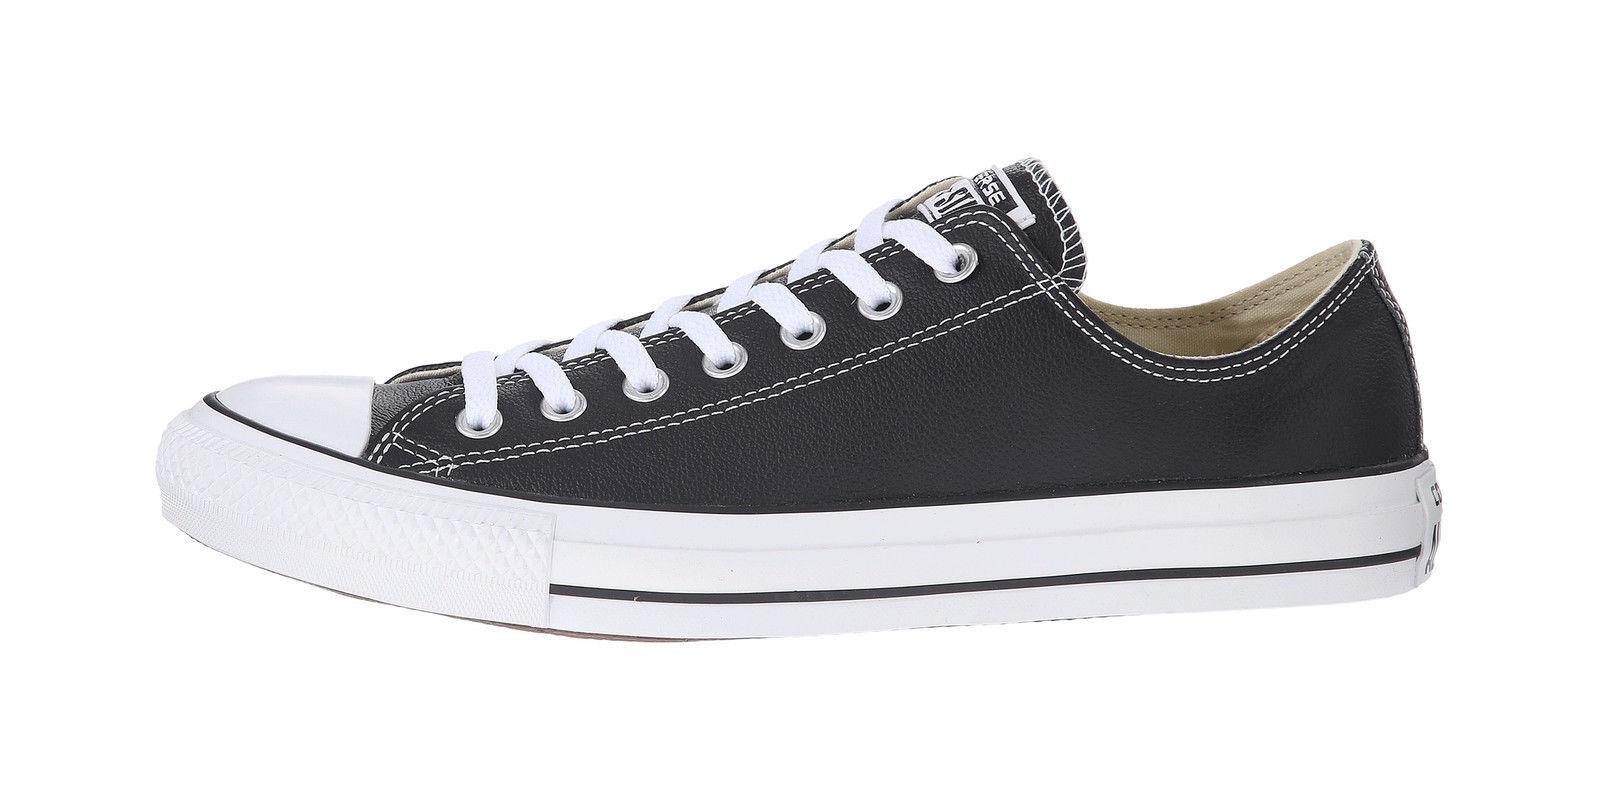 Converse Women Men Unisex All Star Lo Top Leather Shoes Black White Low Chucks